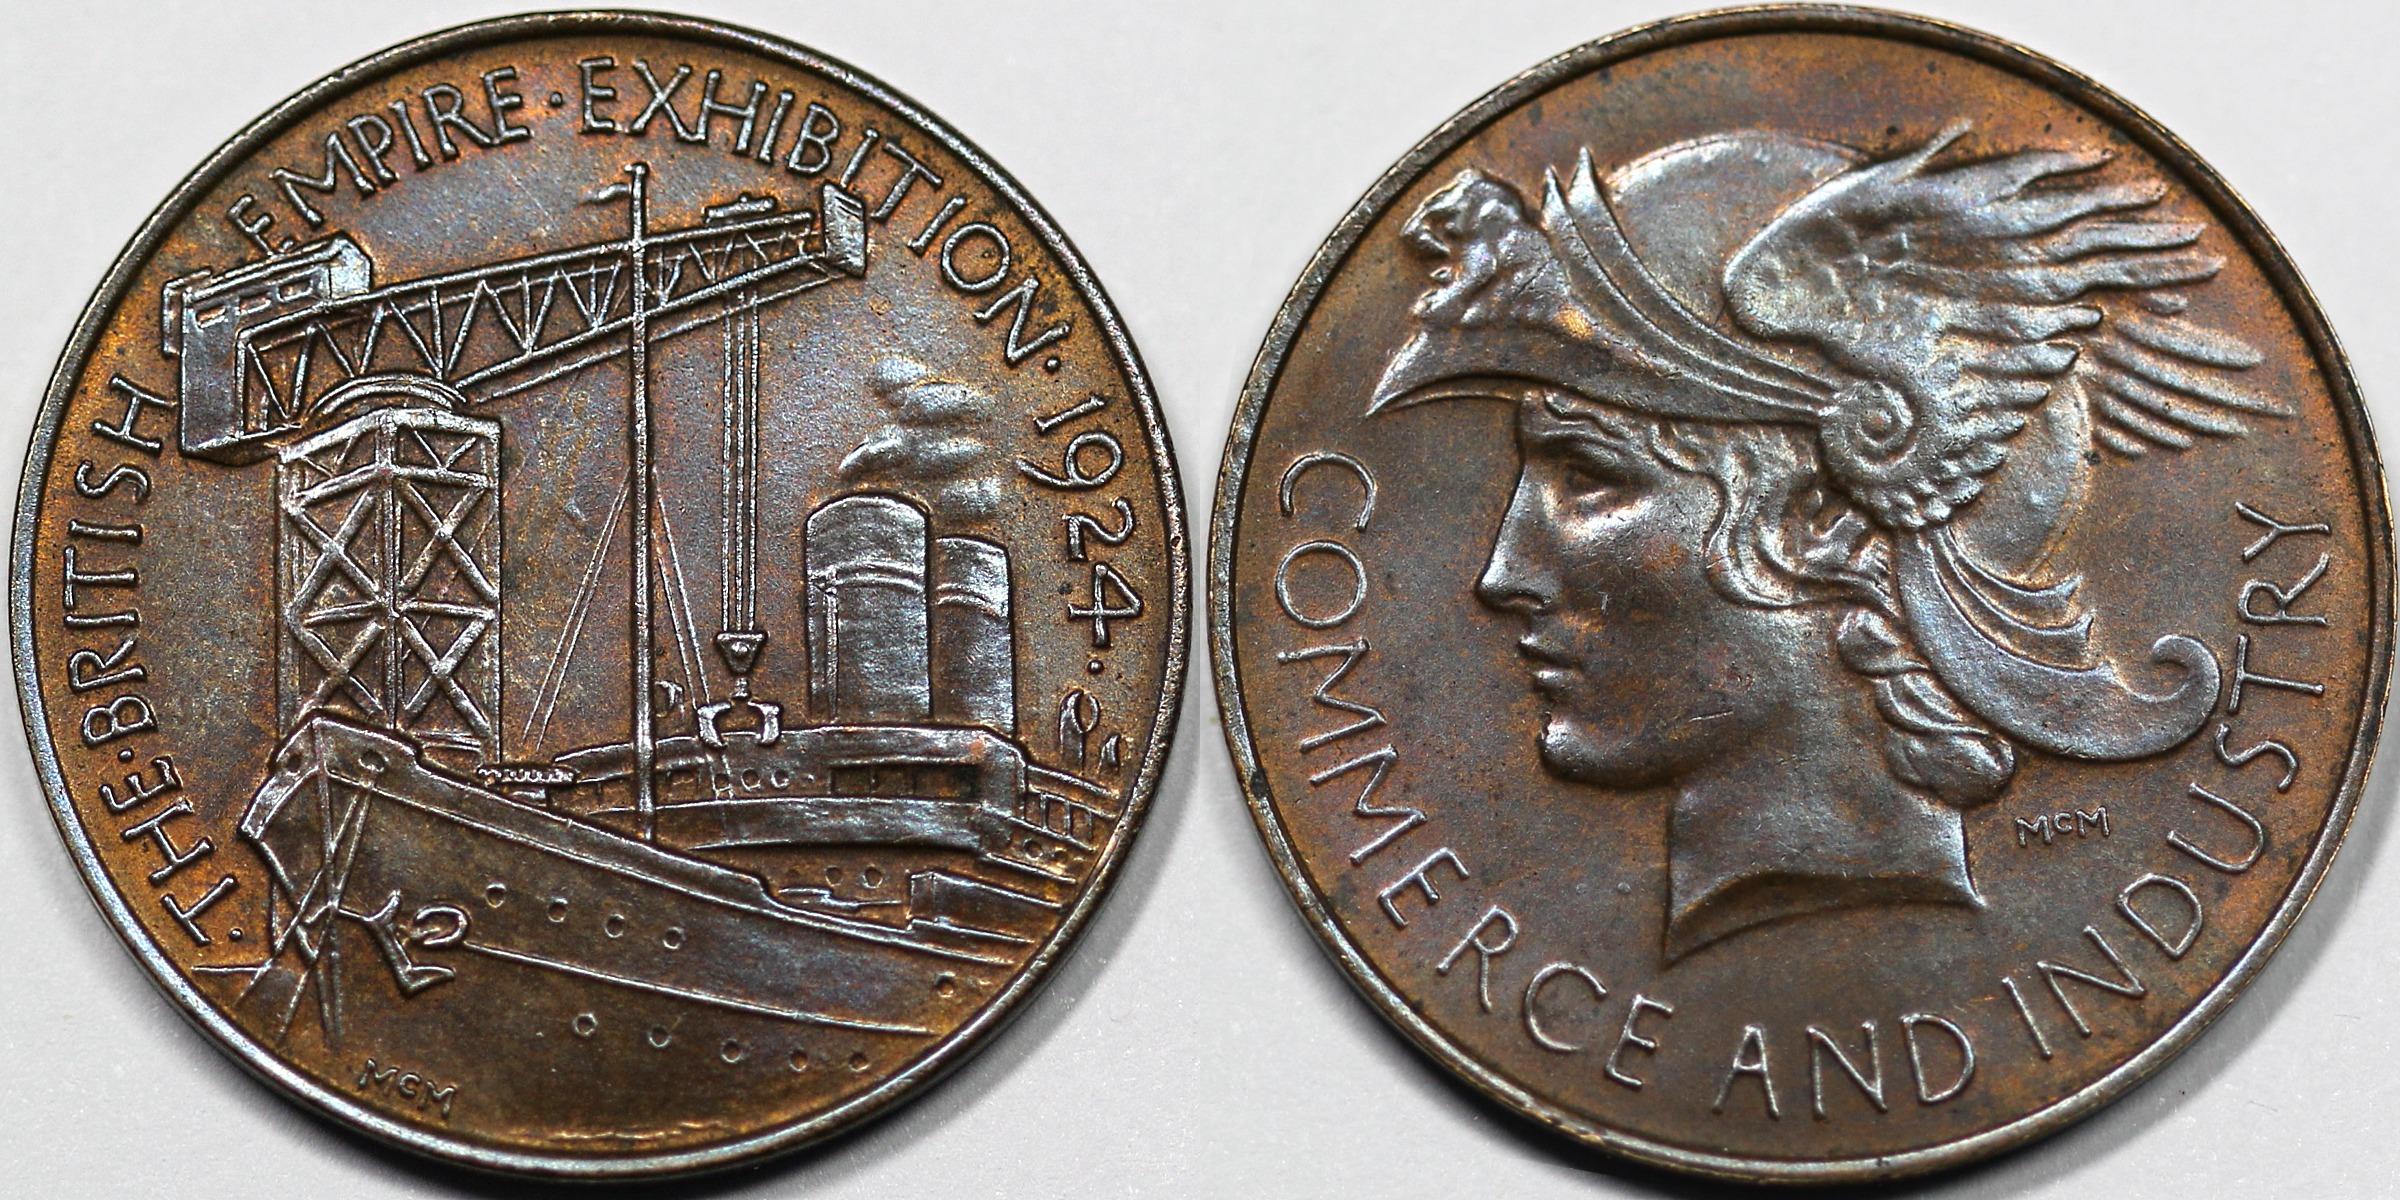 1924_medal_british_empire_exhibition_01_ref_01841_01_2400.jpg